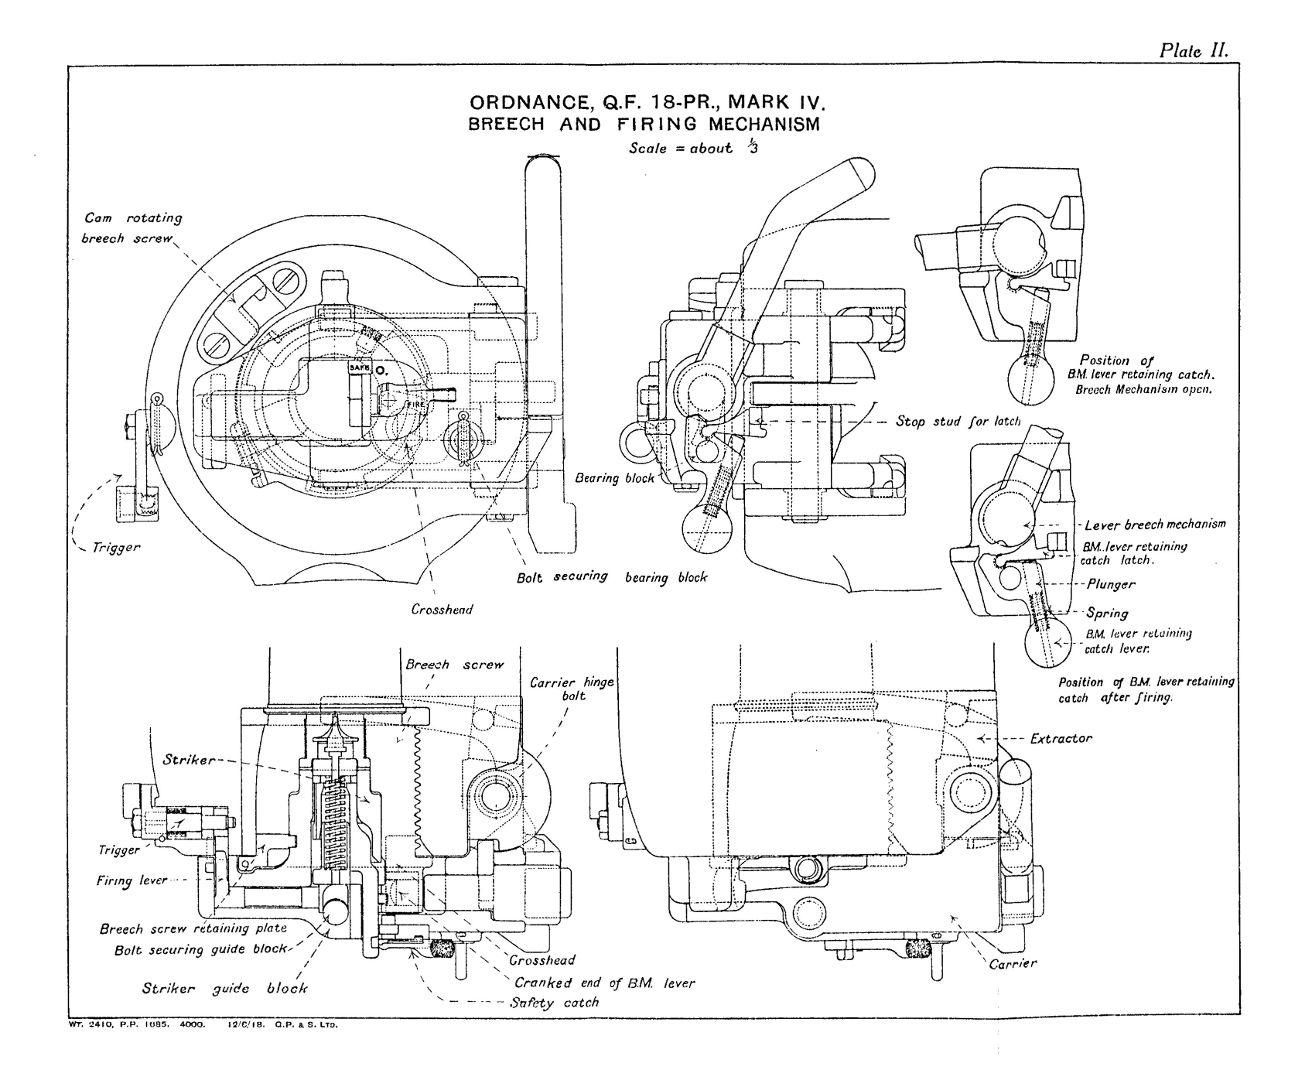 File Qf 18 Pounder Mark Iv Breech And Firing Mechanism